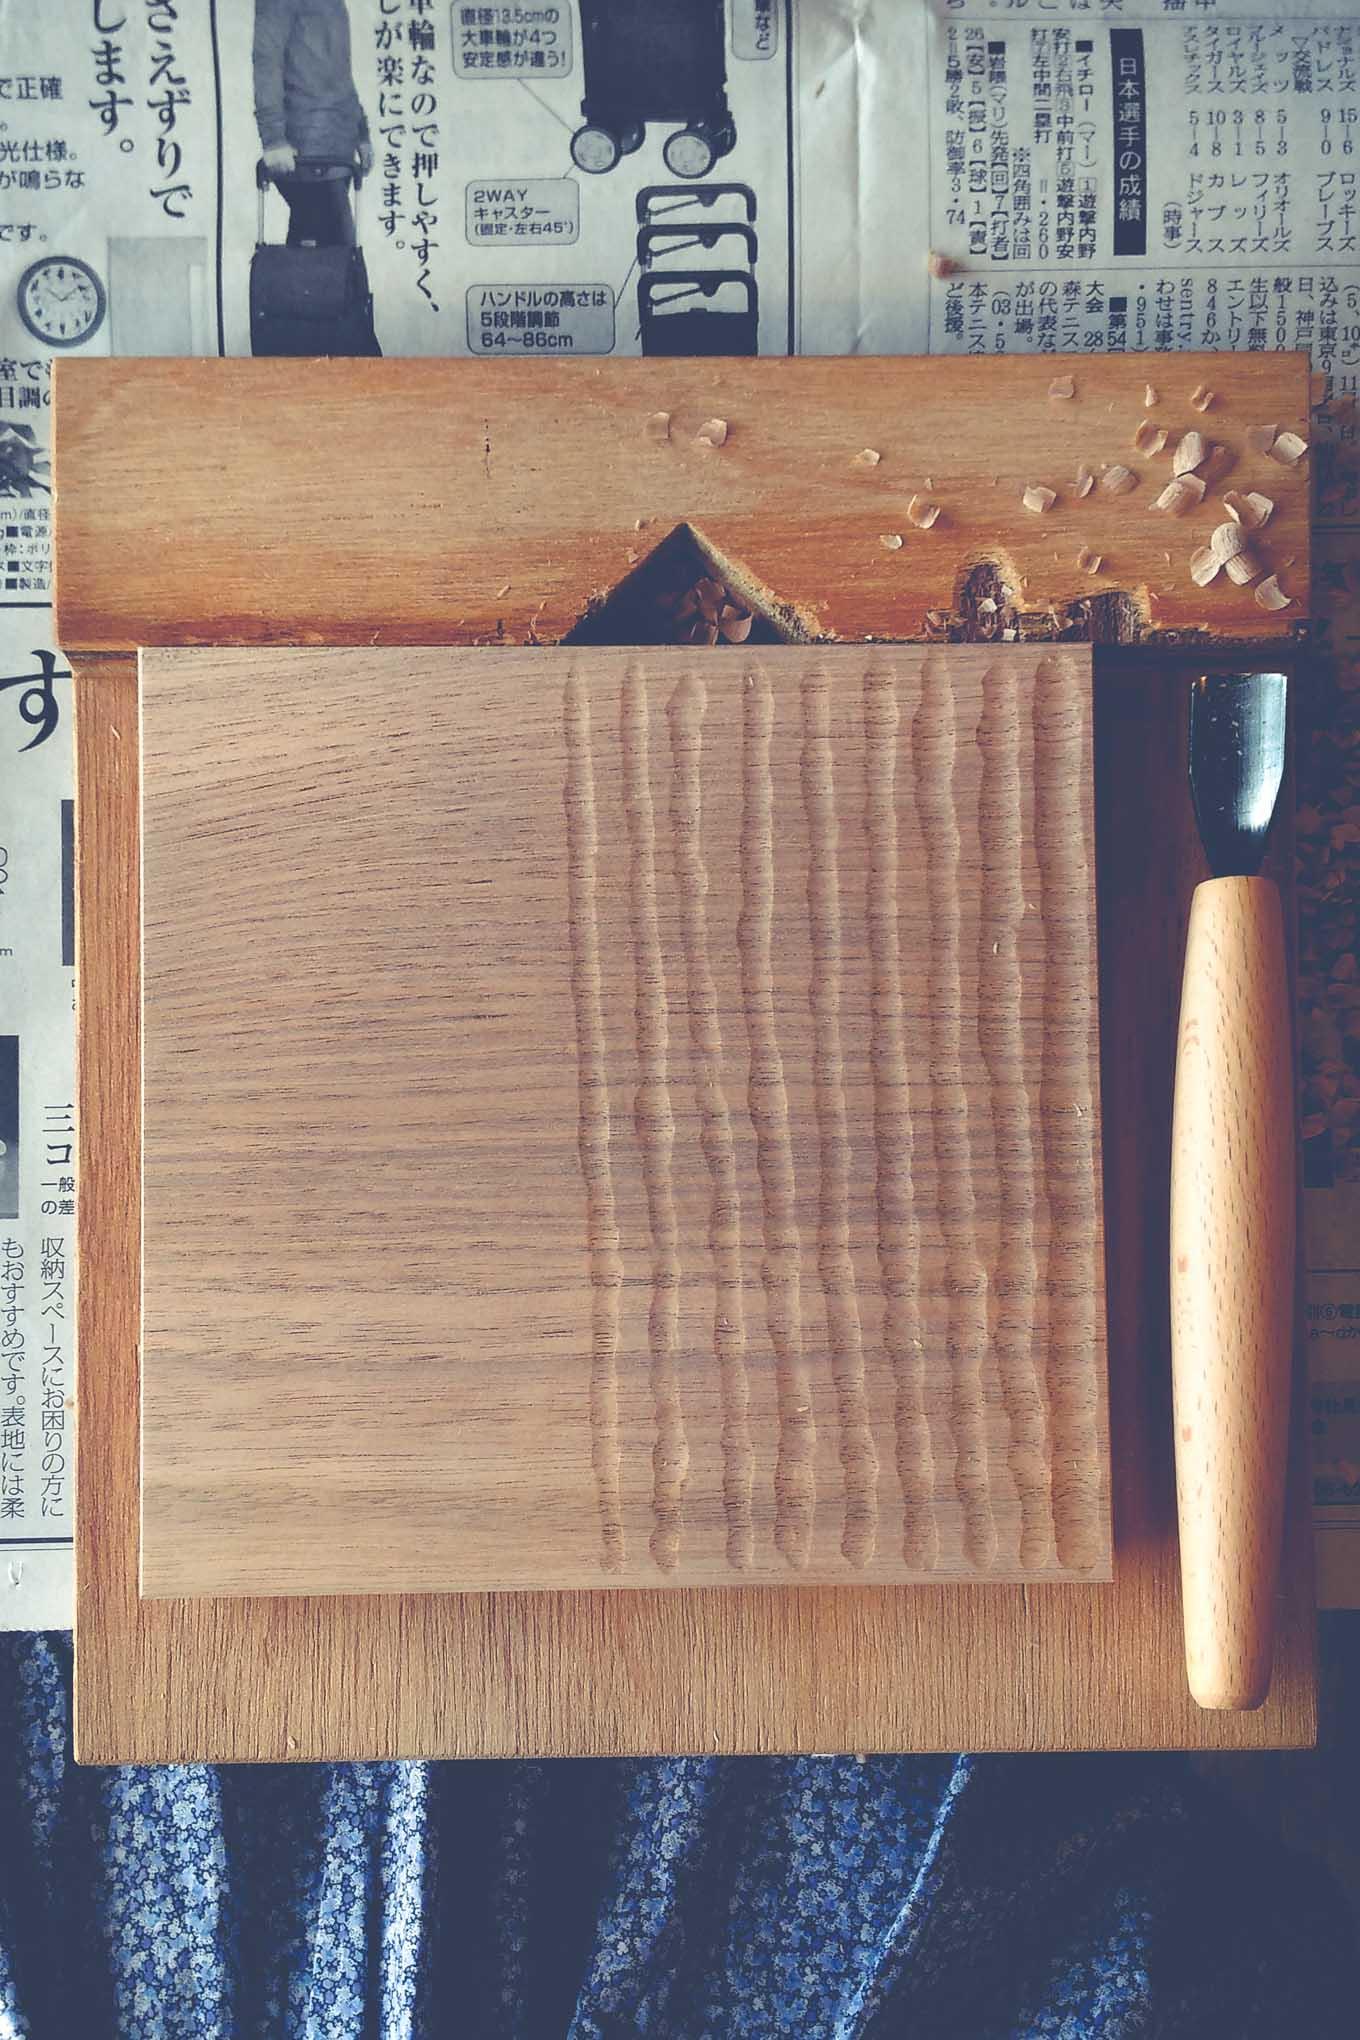 kaga-masayuki-wood-plate-9